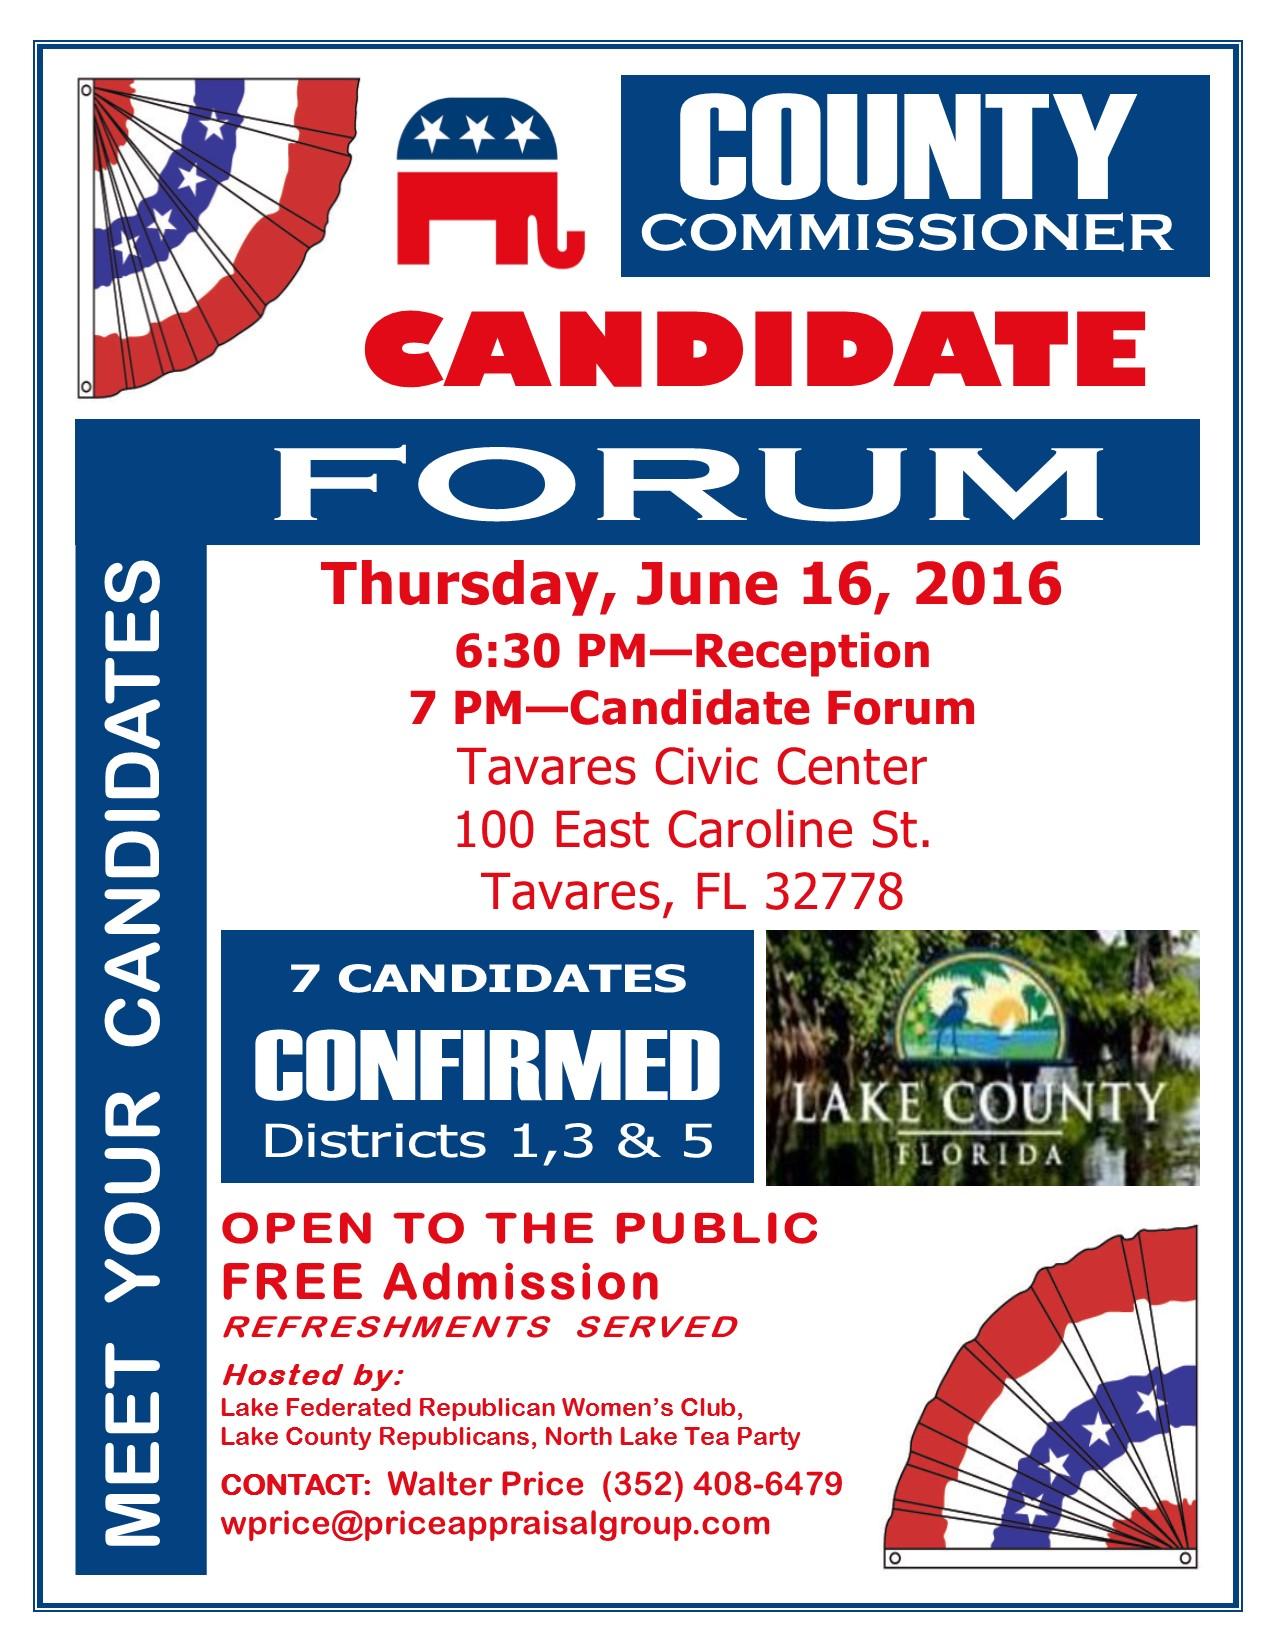 LC_Commissioner_Candidate_Forum_20160616.jpg